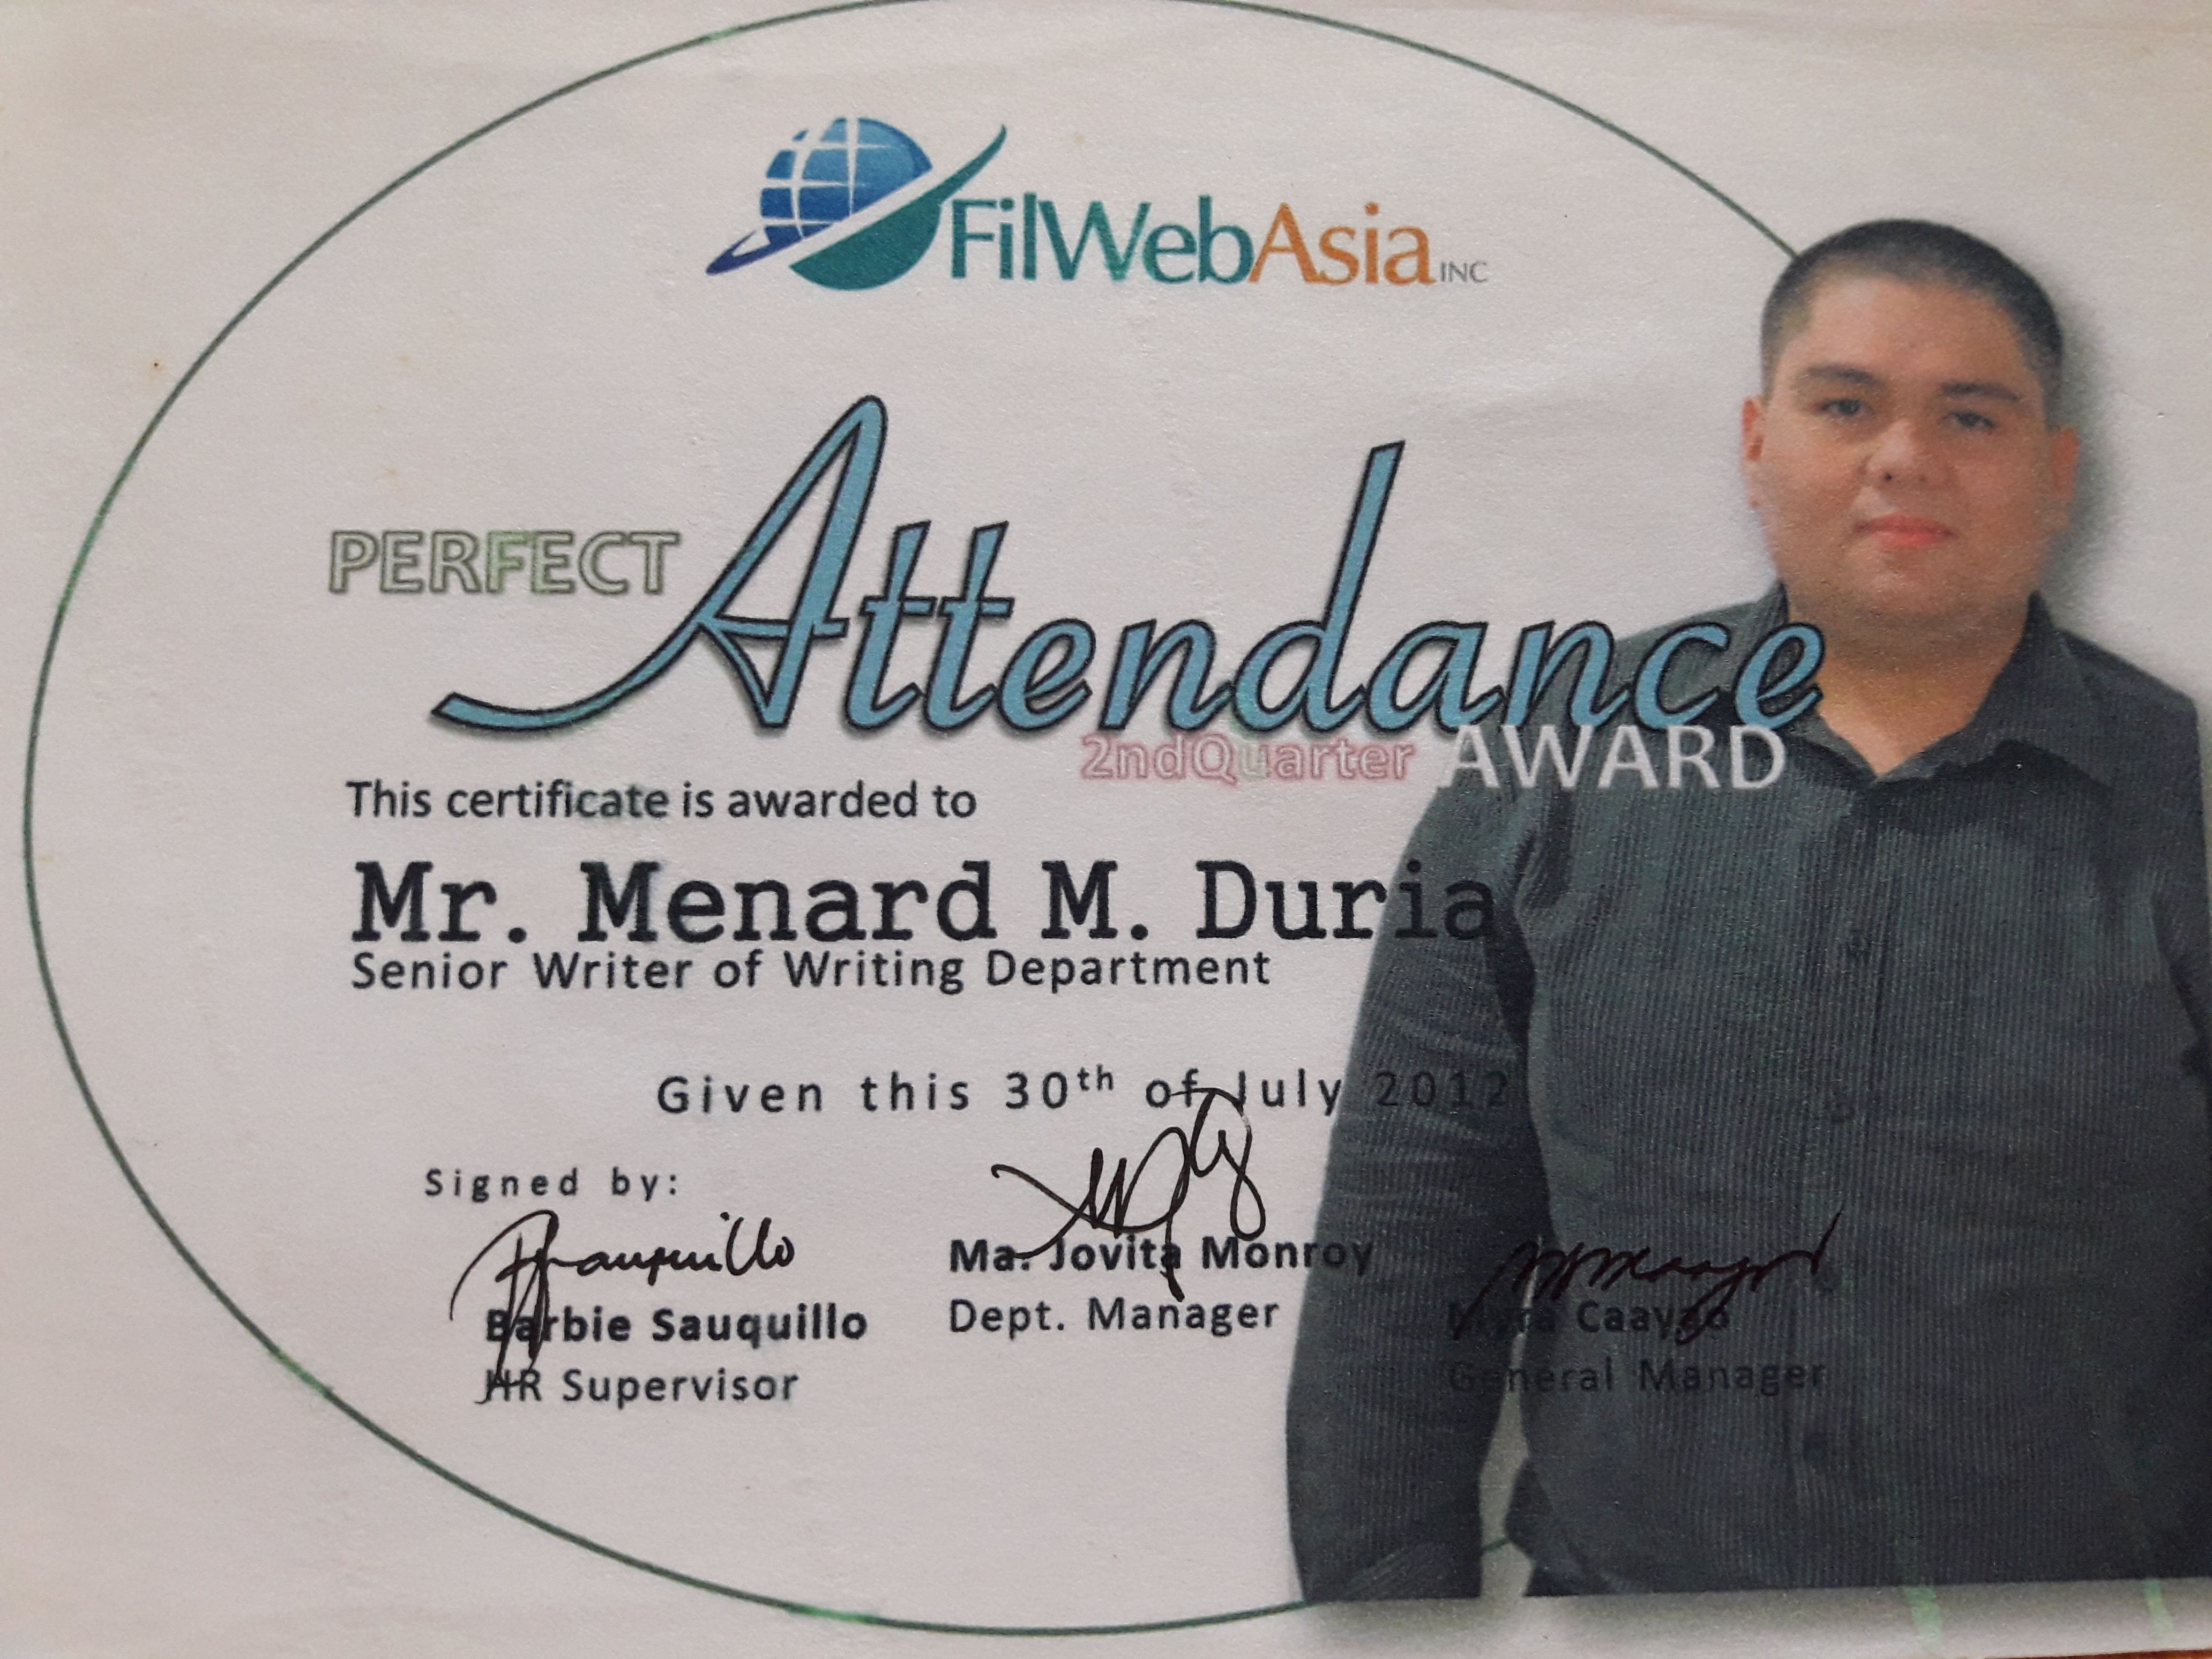 perfect attendance awardee in 2012